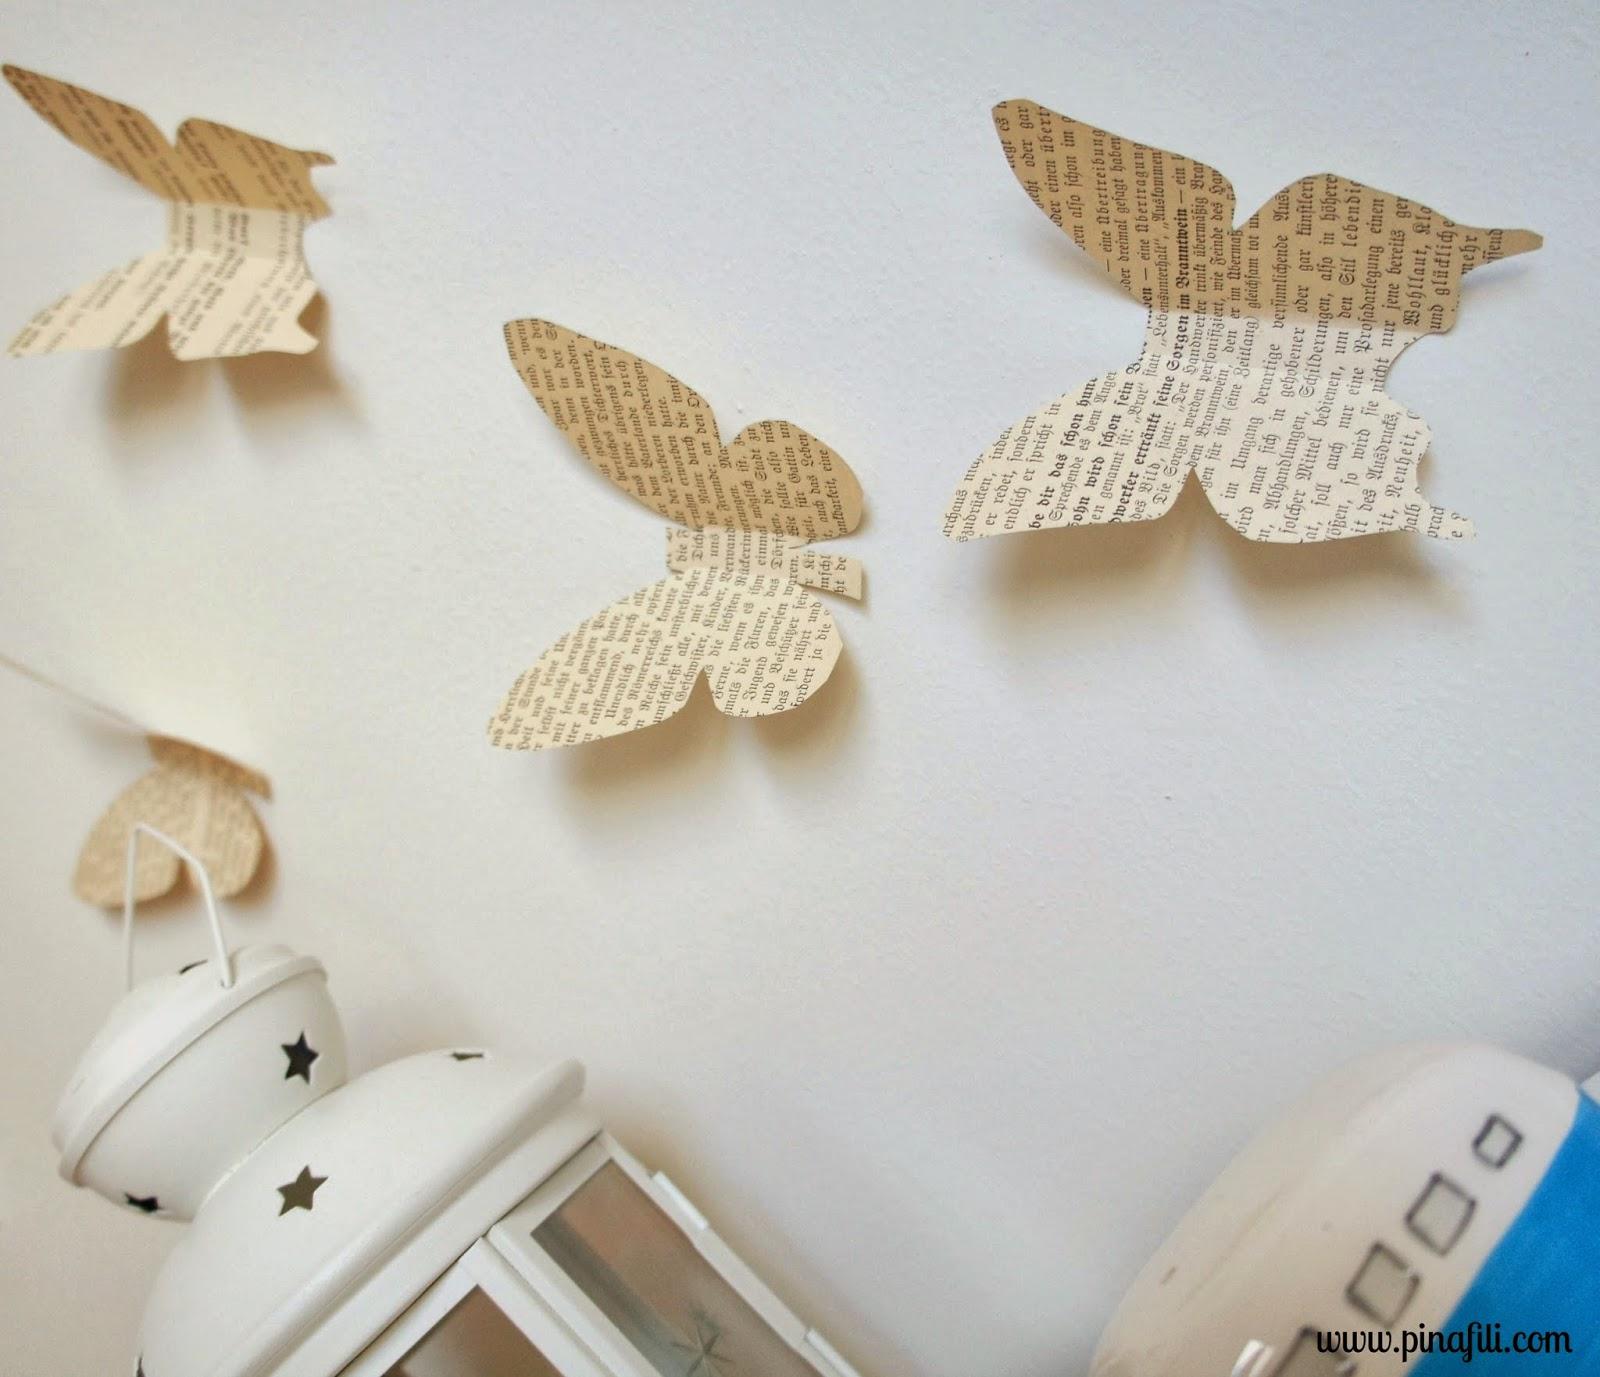 Pinafili diy mariposas de papel para decorar for Como decorar paredes con papel